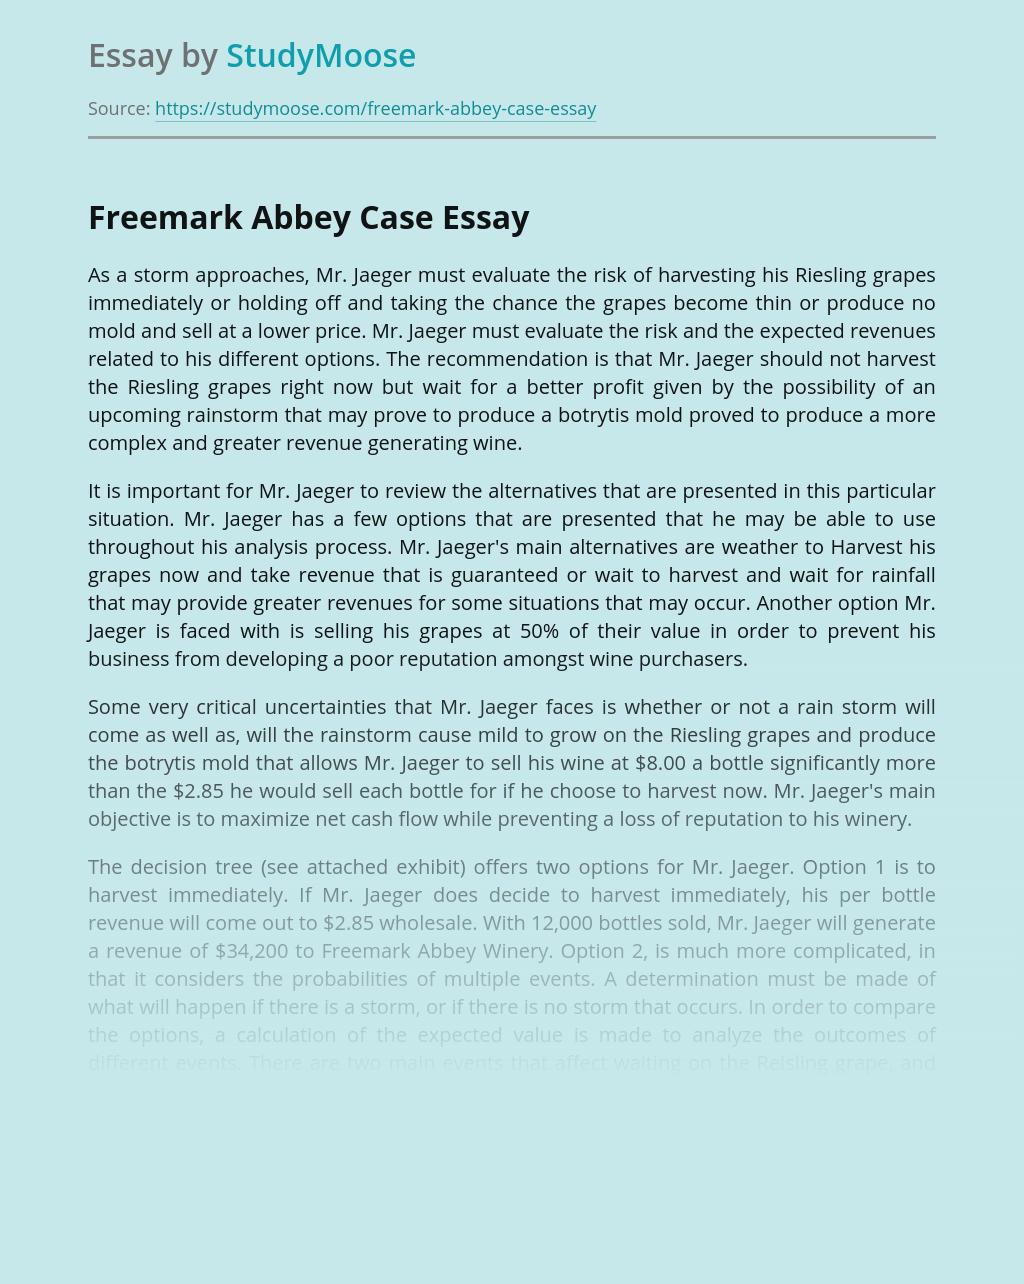 Freemark Abbey Case